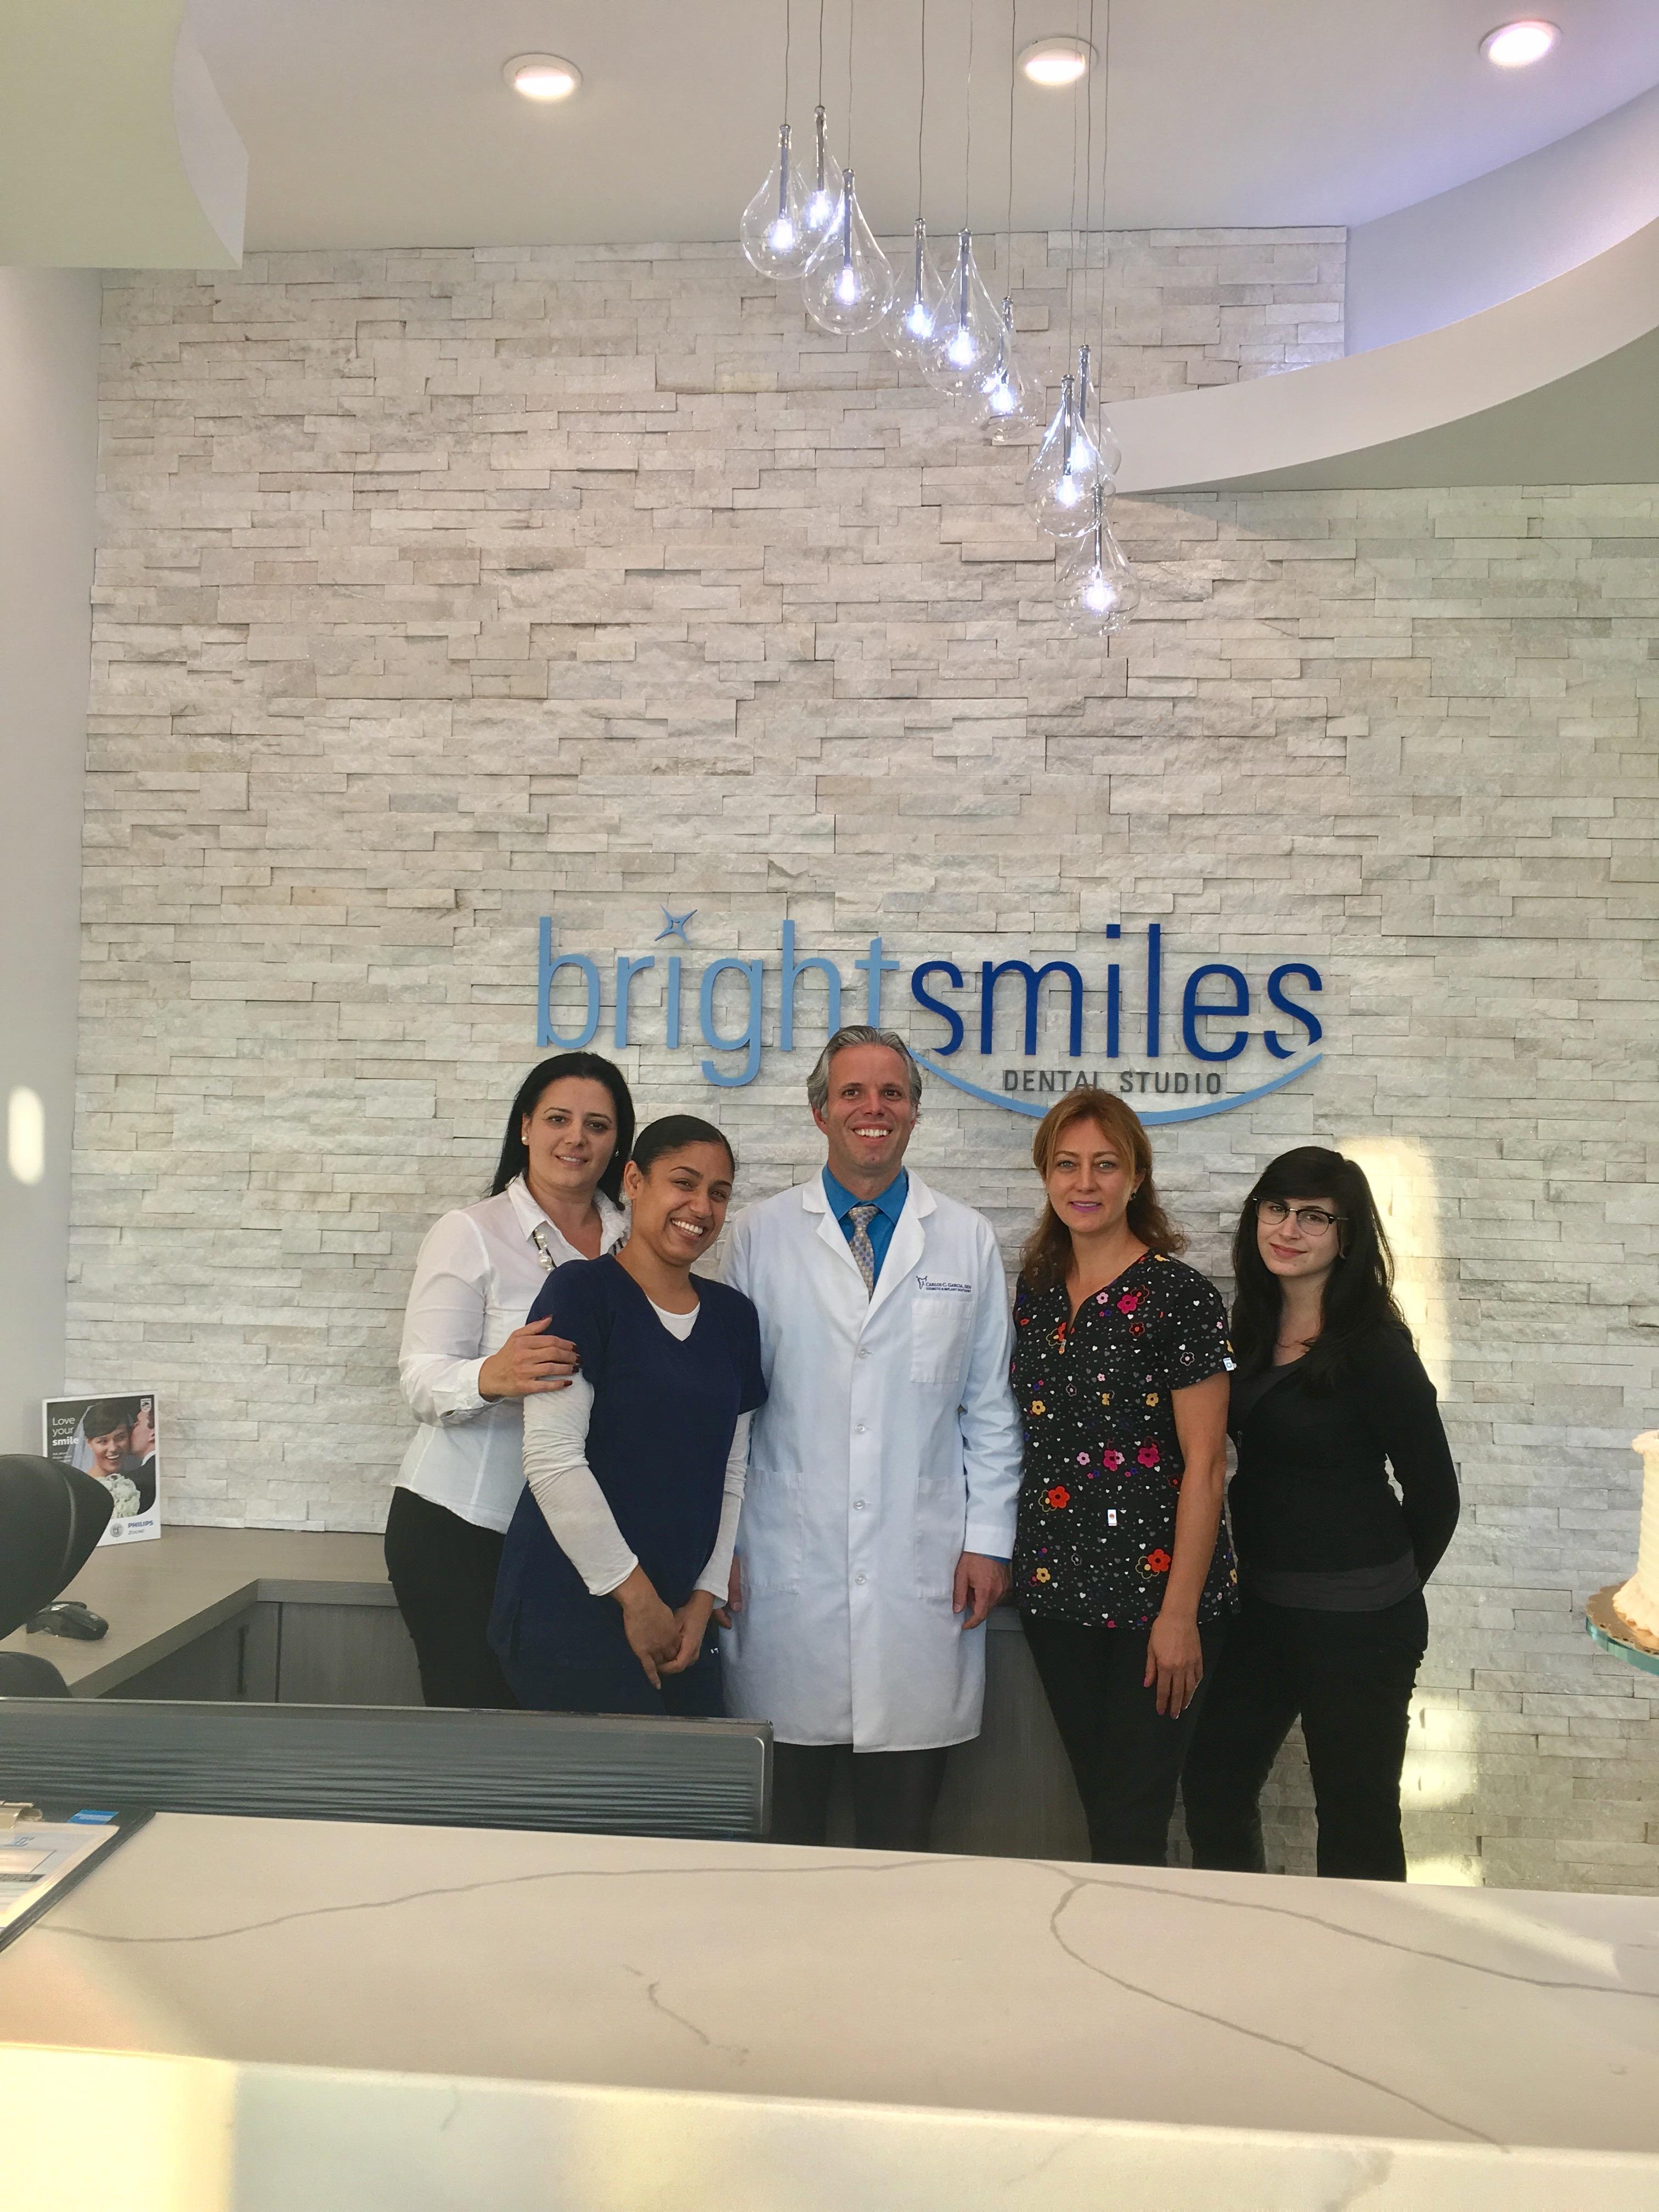 Bright Smiles Dental Studio image 1